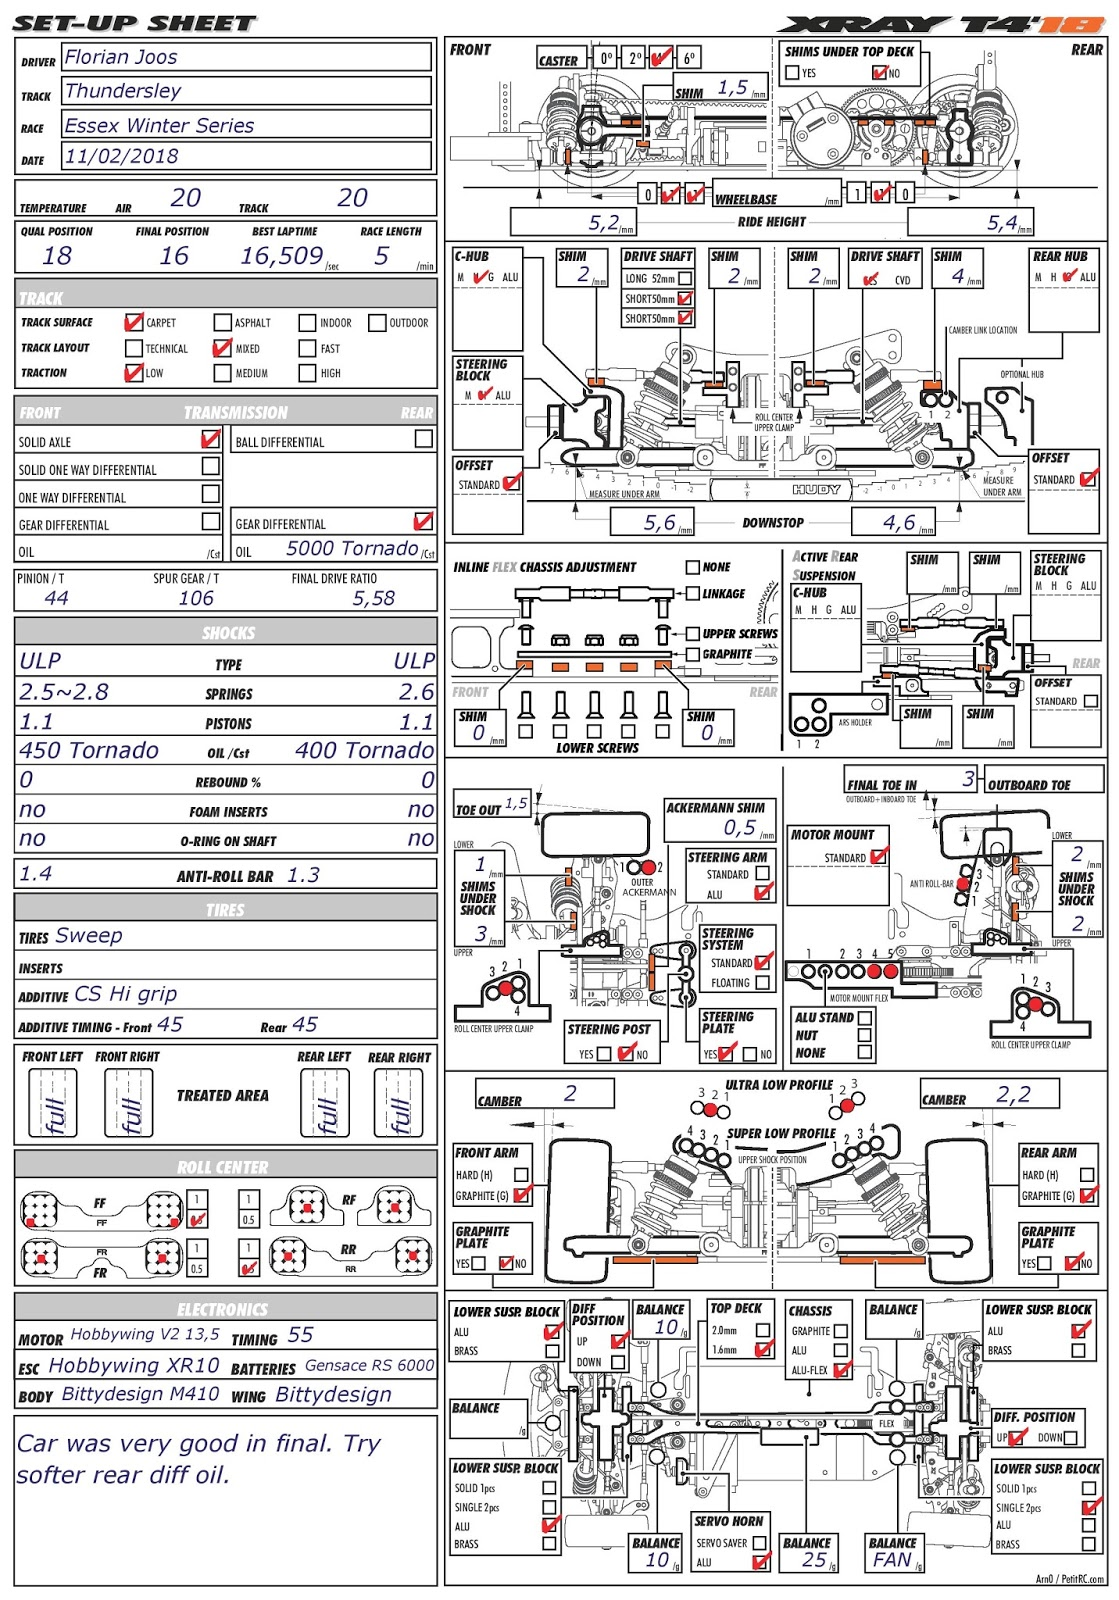 1972 bmw 2002 wiring diagram wiring library1972 bmw 2002 wiring diagram [ 1119 x 1600 Pixel ]